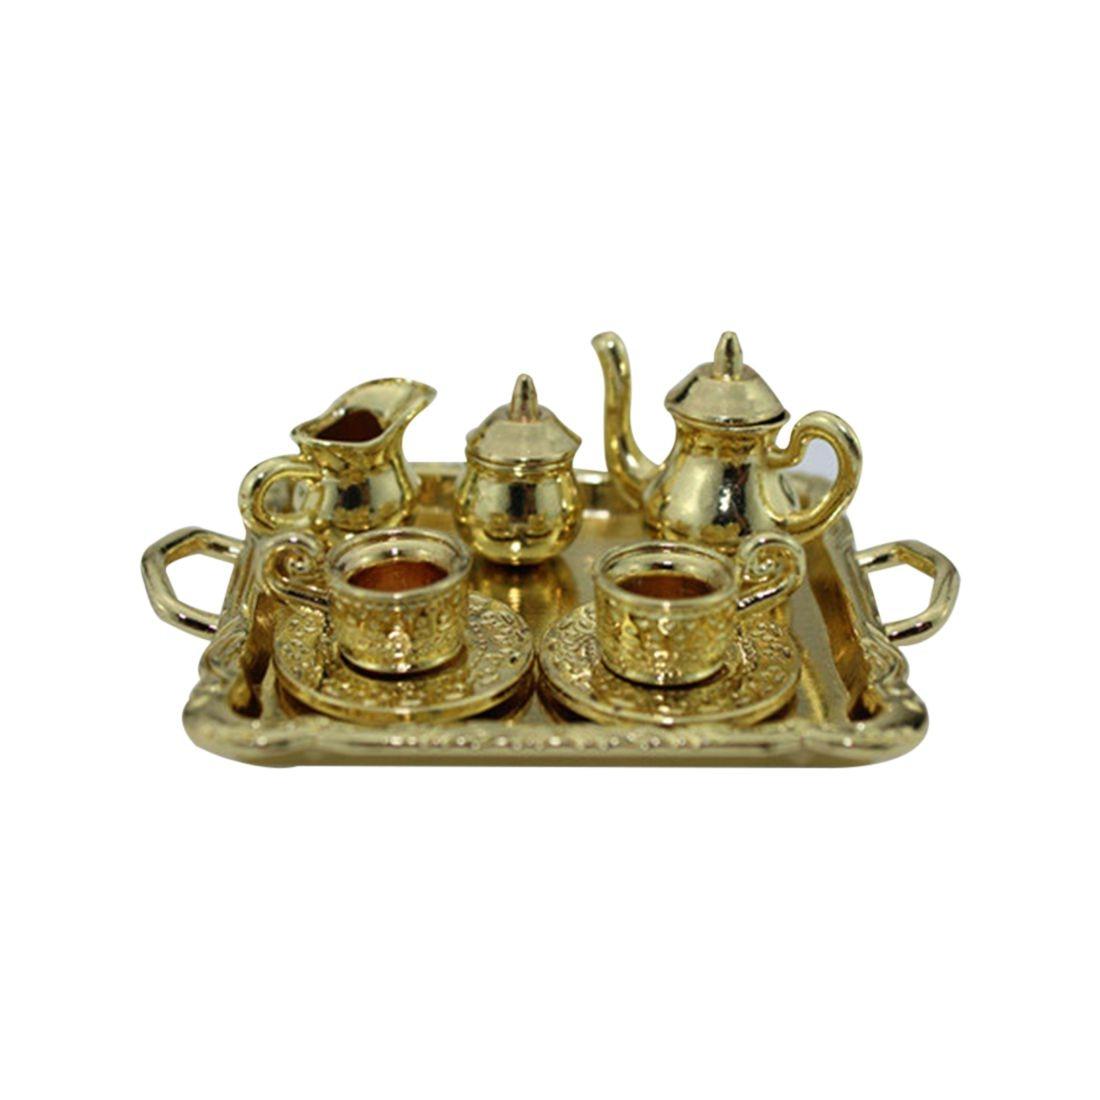 LCLL-Dollhouse Miniature 1: 12 Toy 8 Pcs Metal Tea Set Length 6.5cm